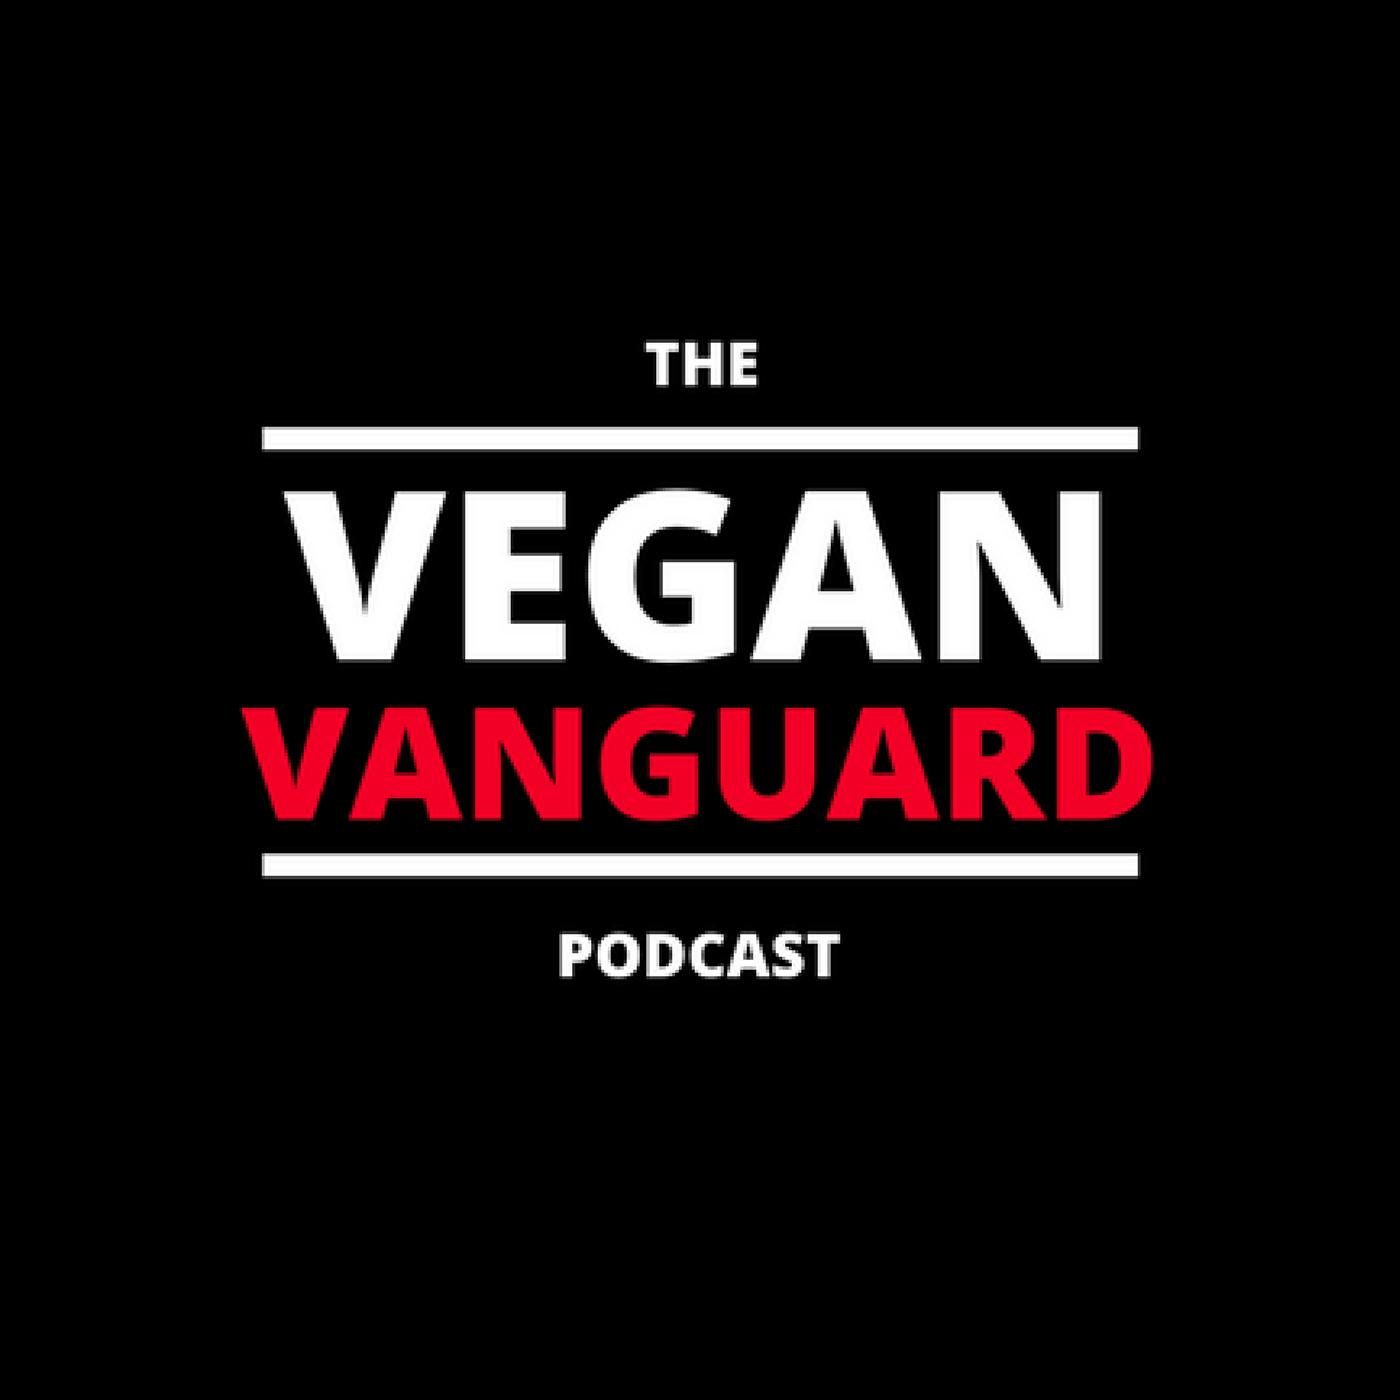 The Vegan Vanguard